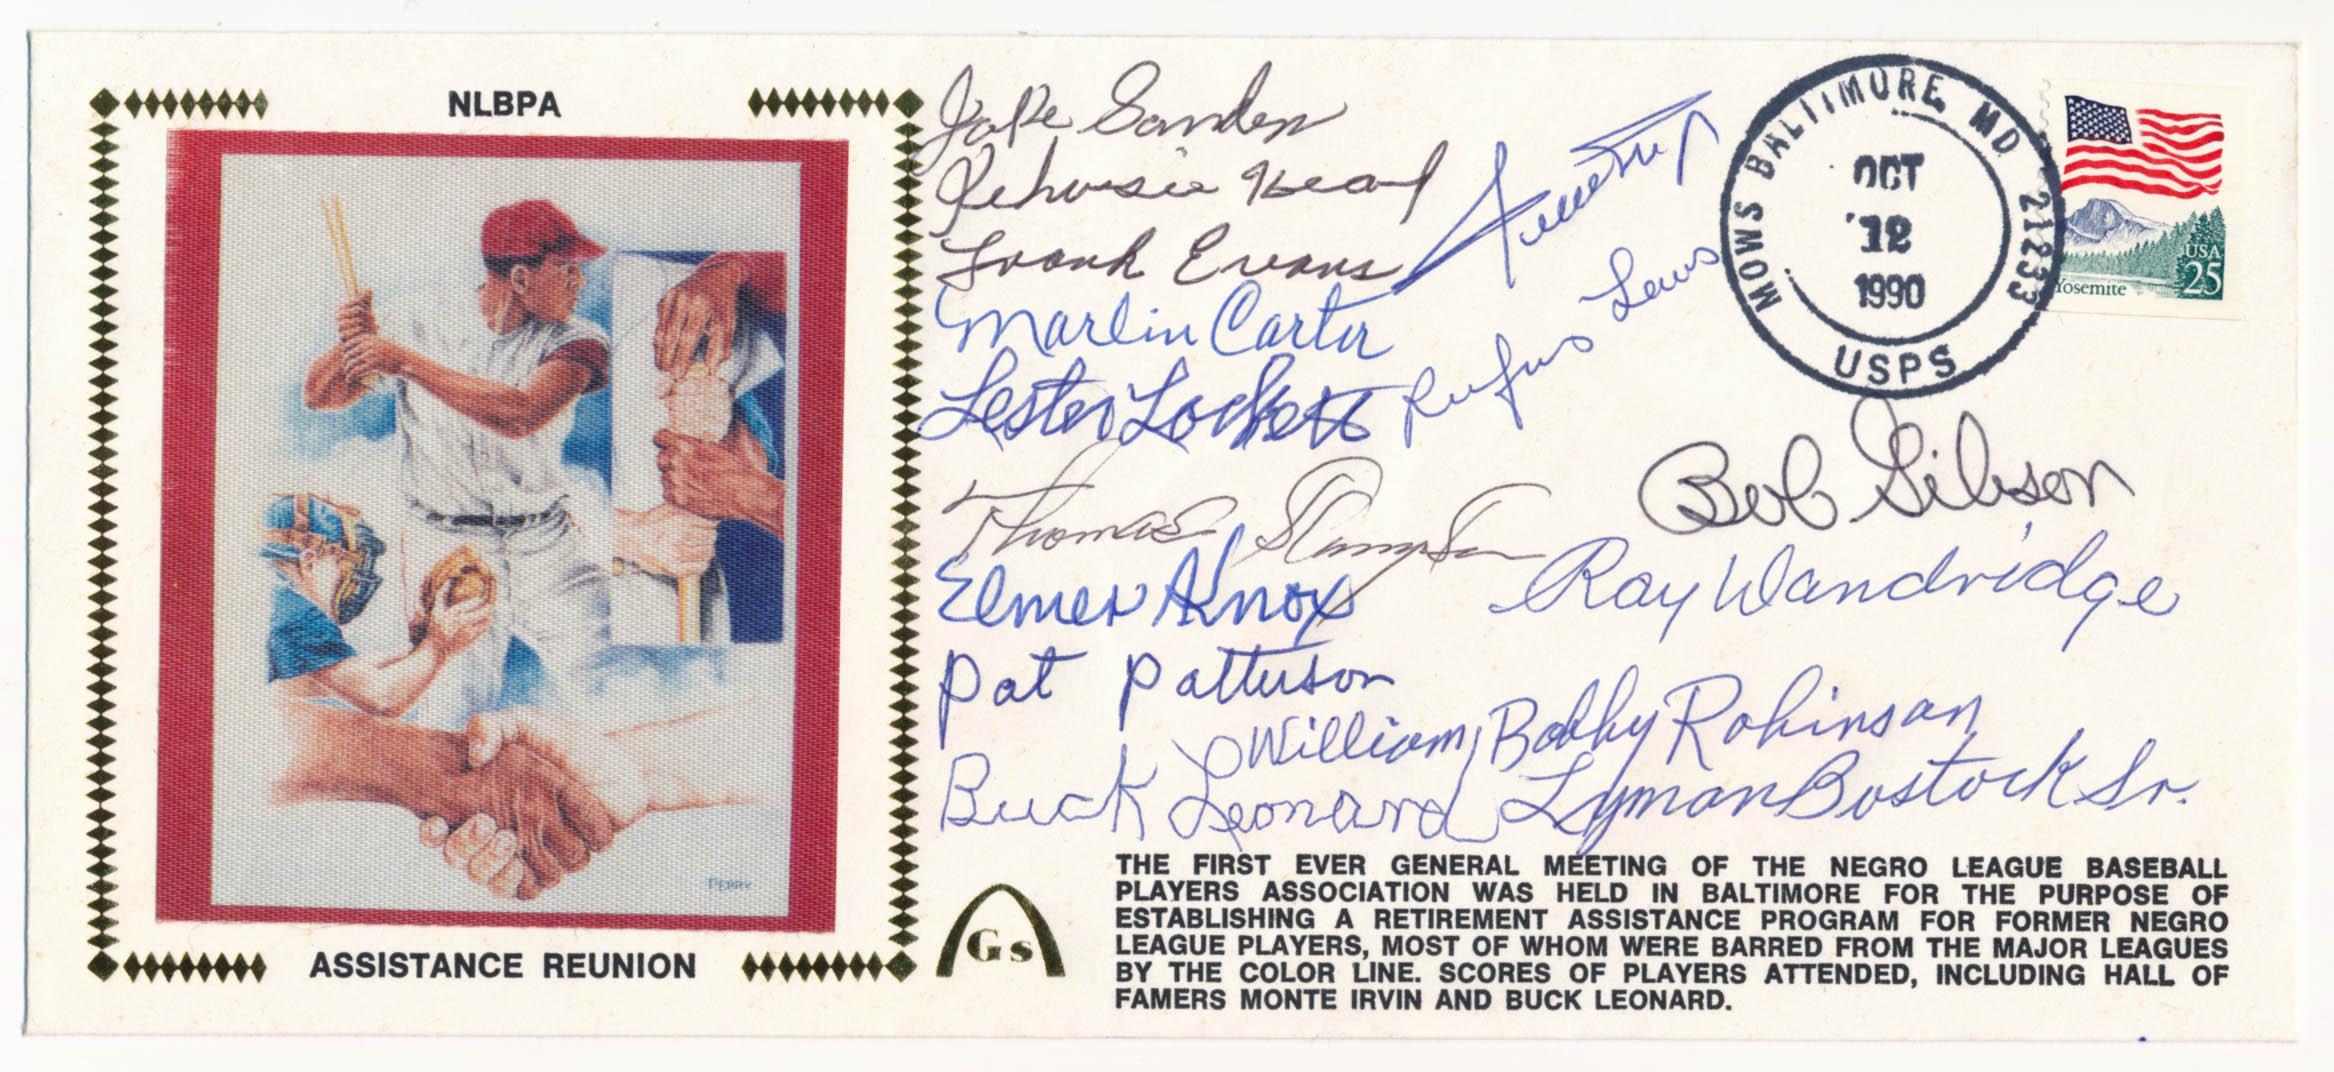 Lot #492  Cachet  1990 Negro Leauers Signed Cachet (17 sigs) Cond: 9.5